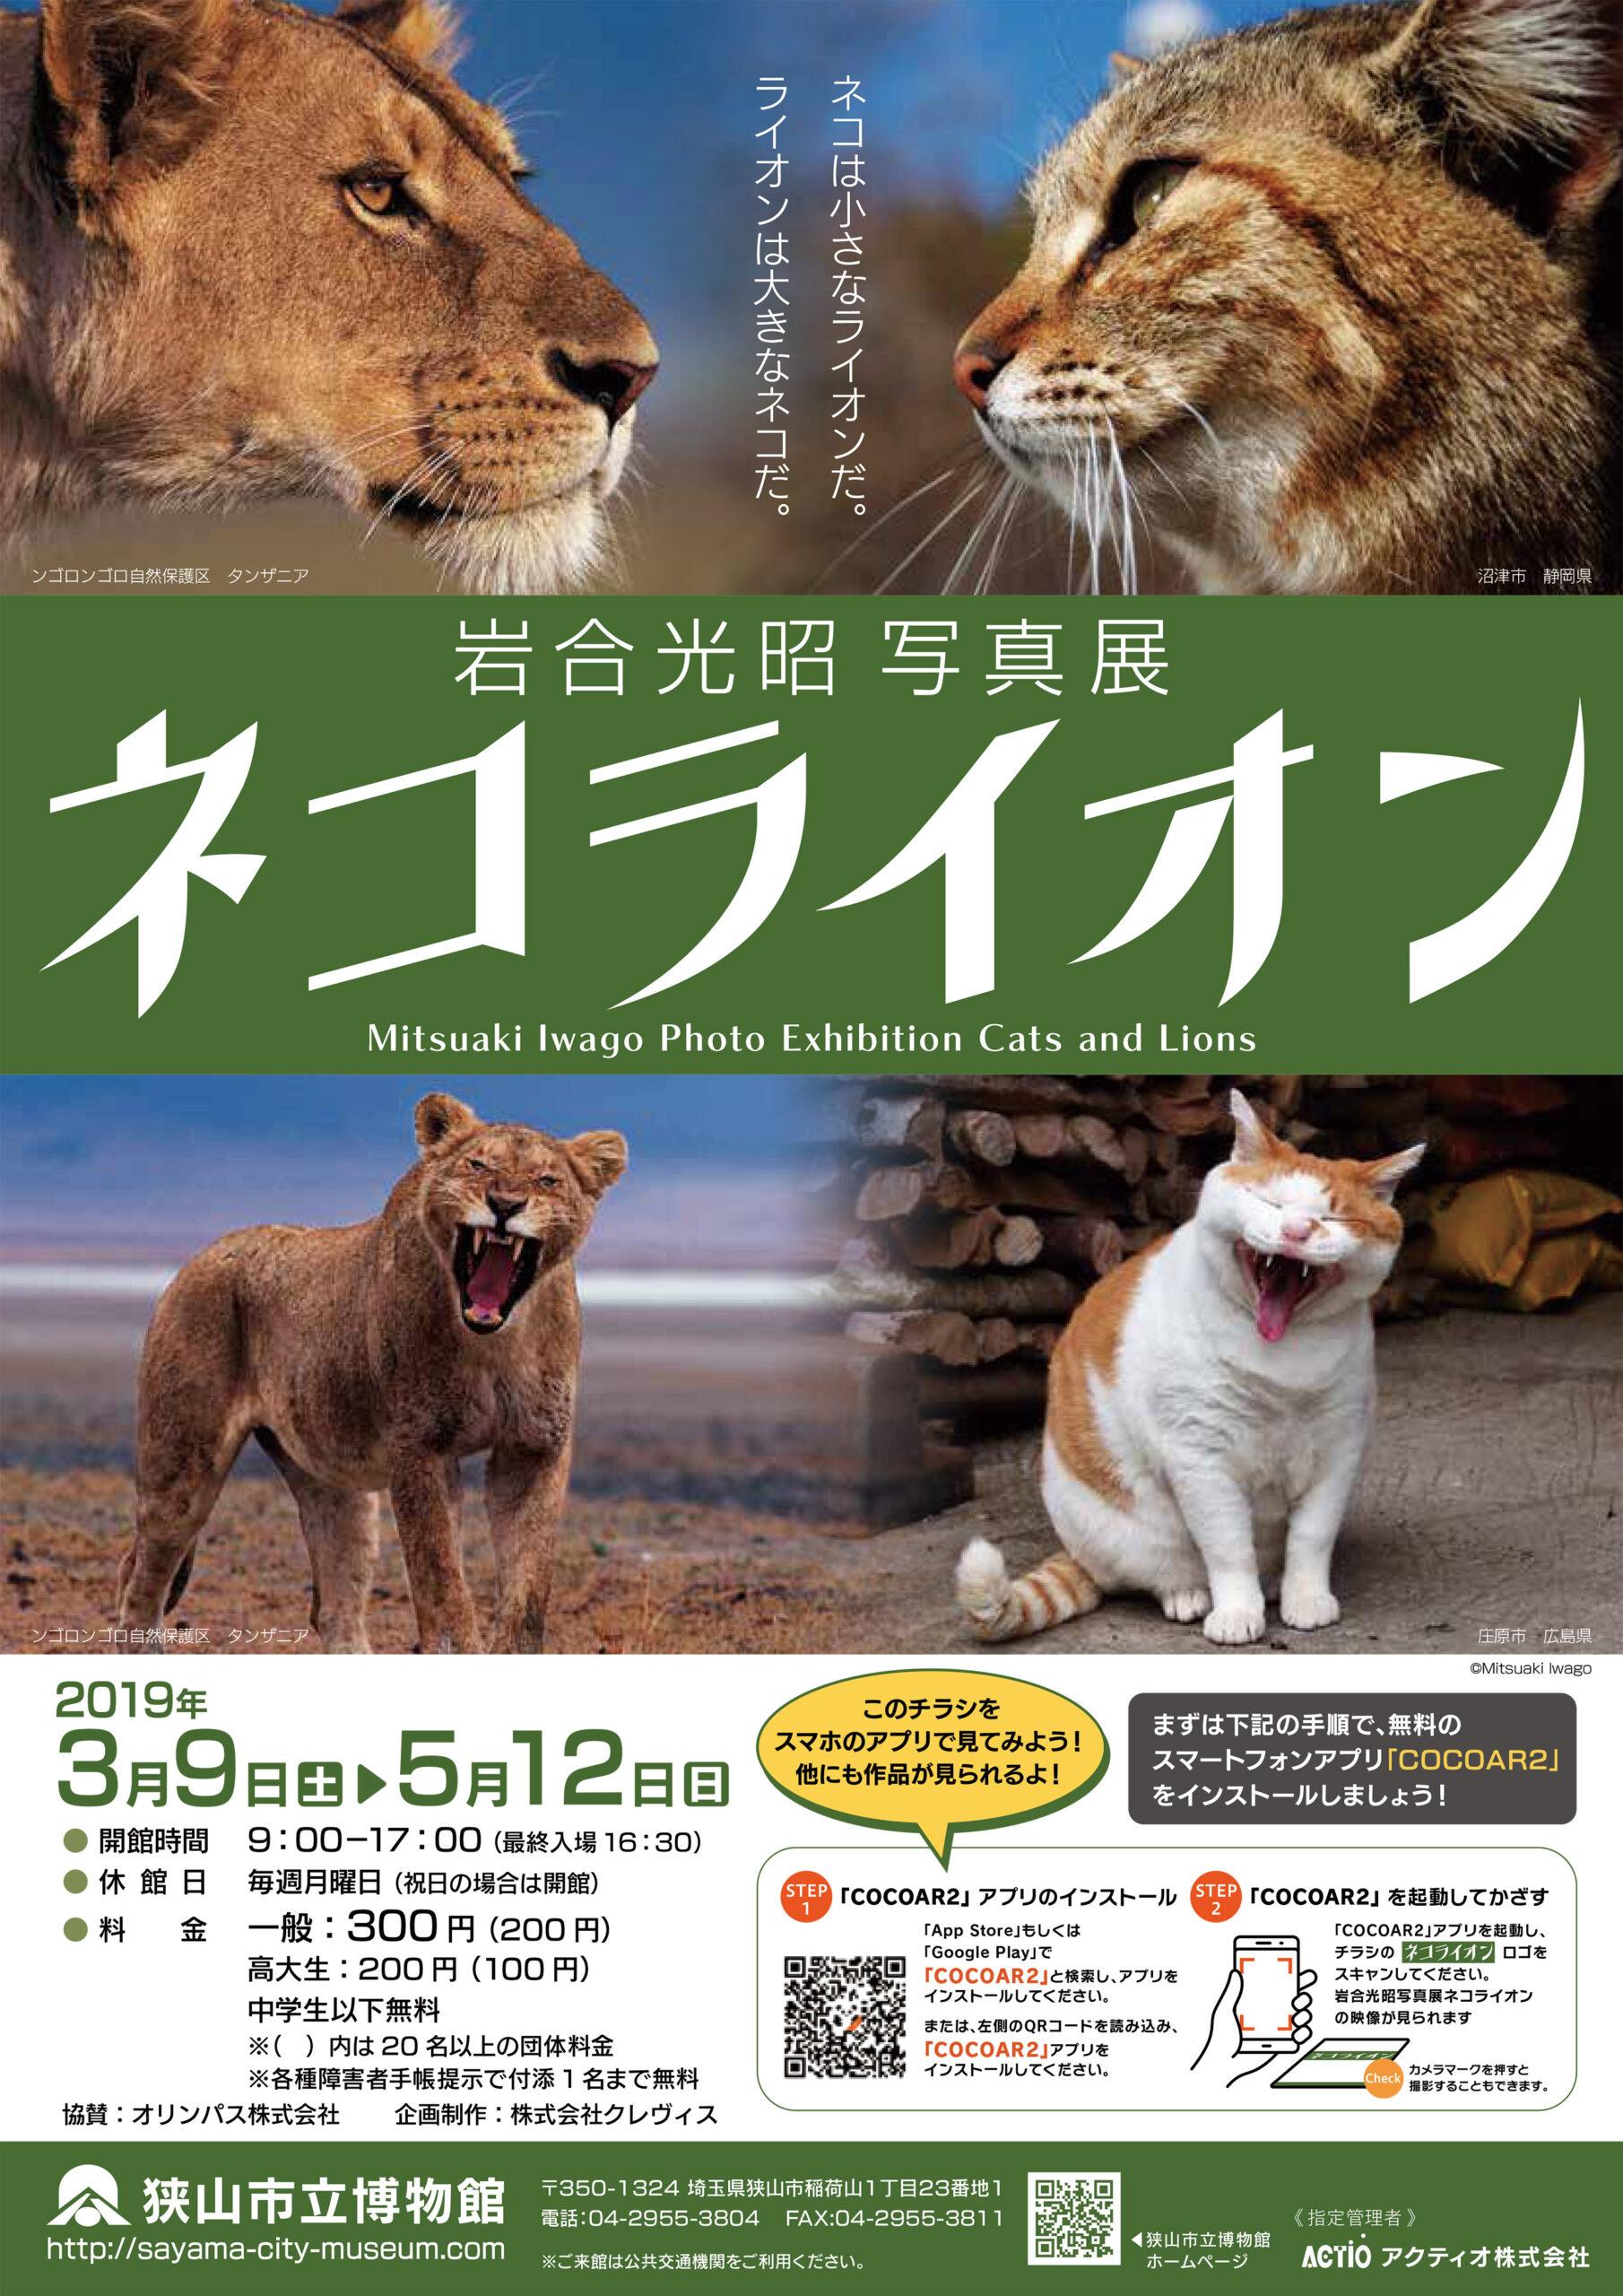 平成31年度 春期企画展「岩合光昭写真展 ネコライオン」